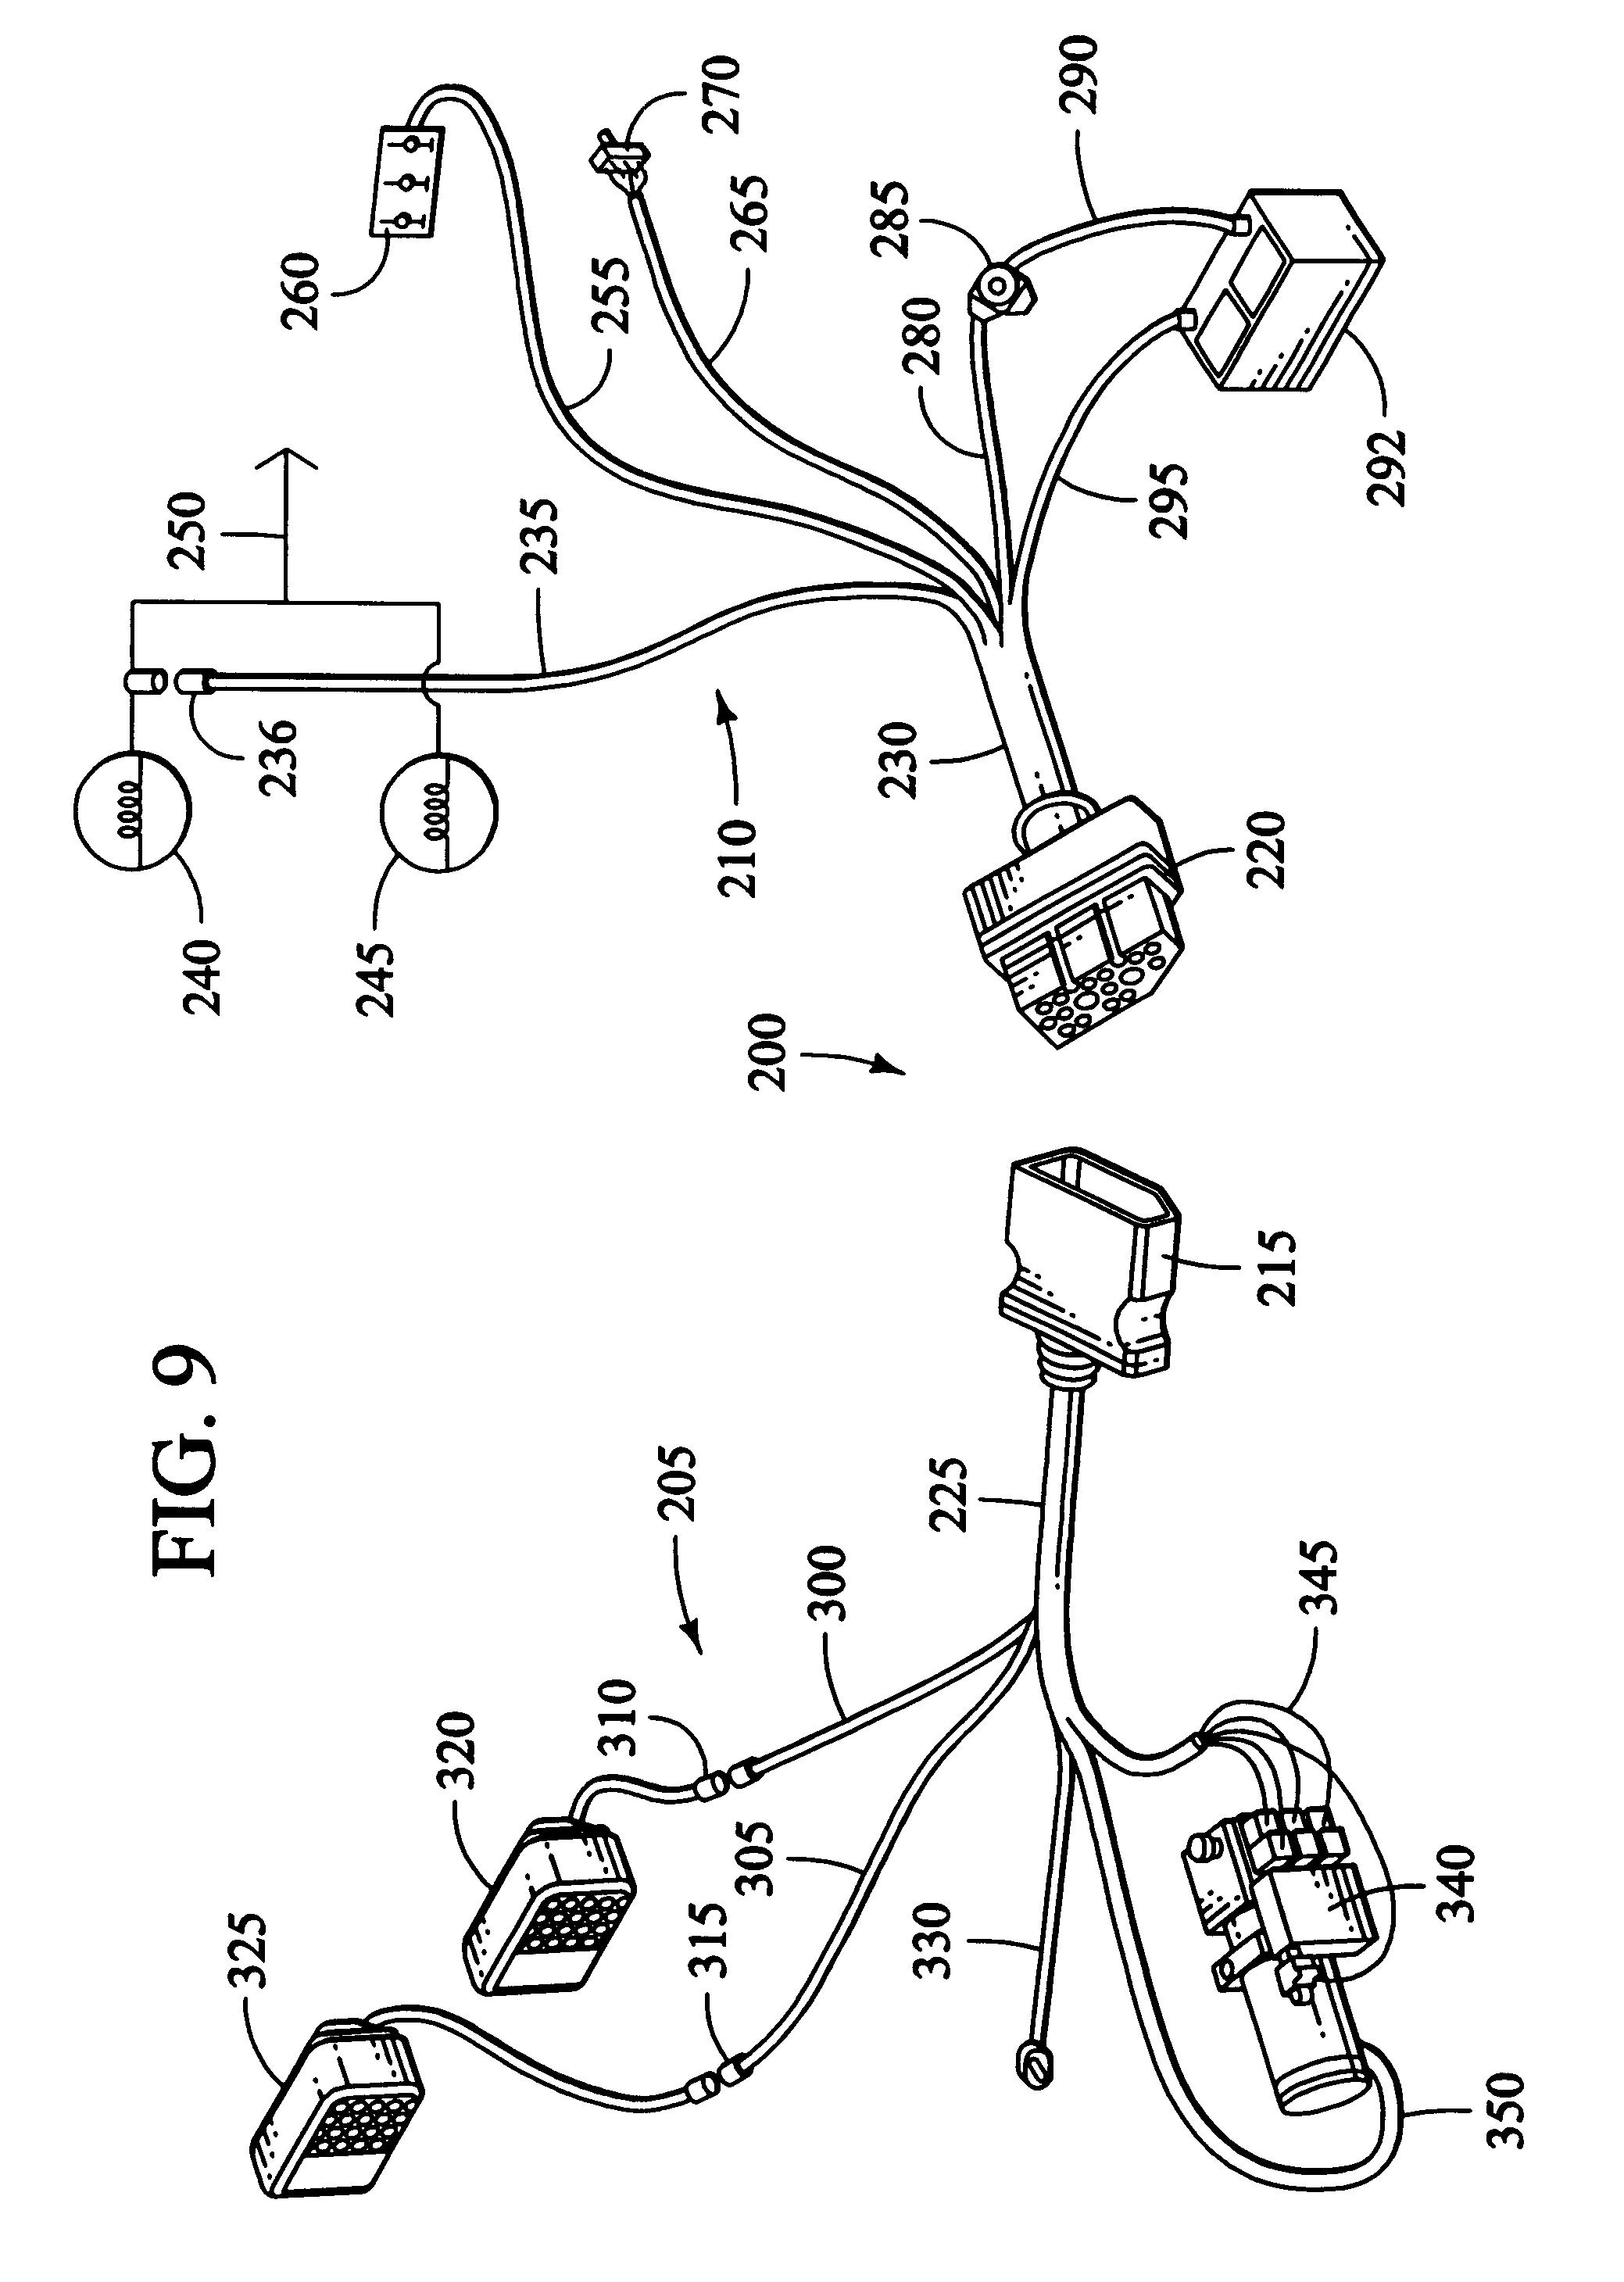 patent us6504306 headlight adapter system google patents patent drawing